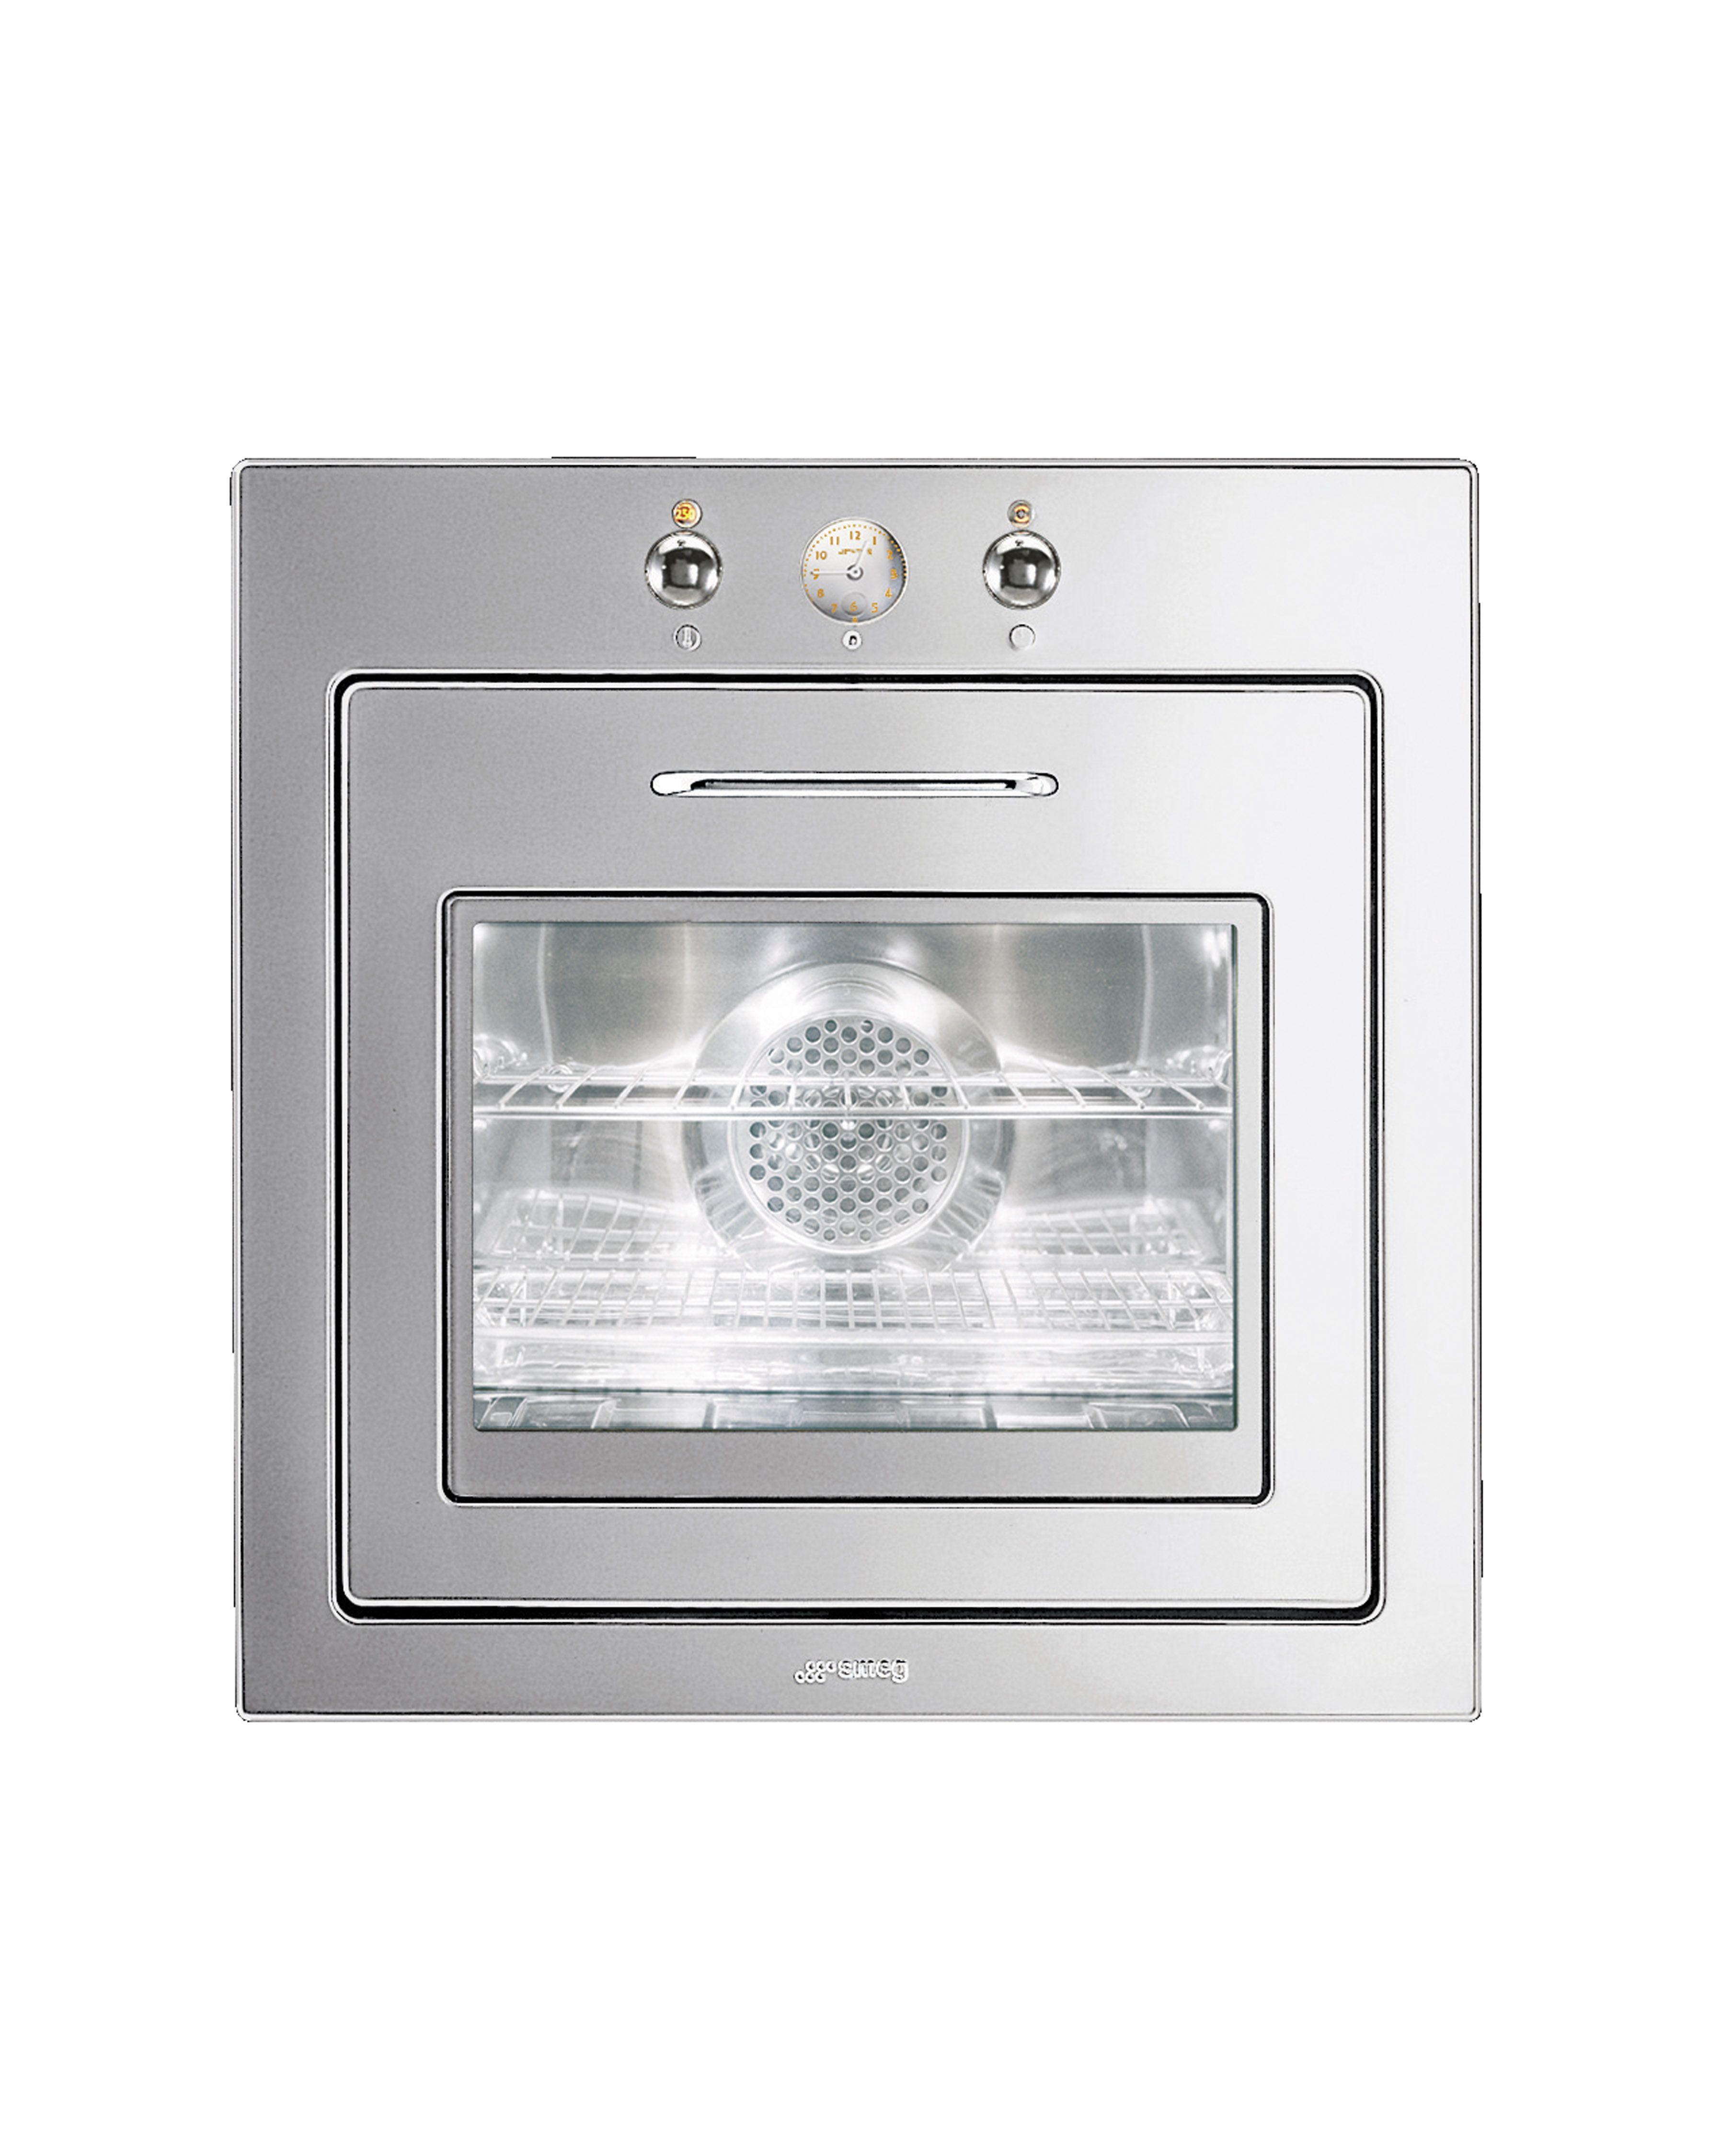 Smeg Oven Designed by Renzo Piano | Piano | Pinterest | Pianos ...